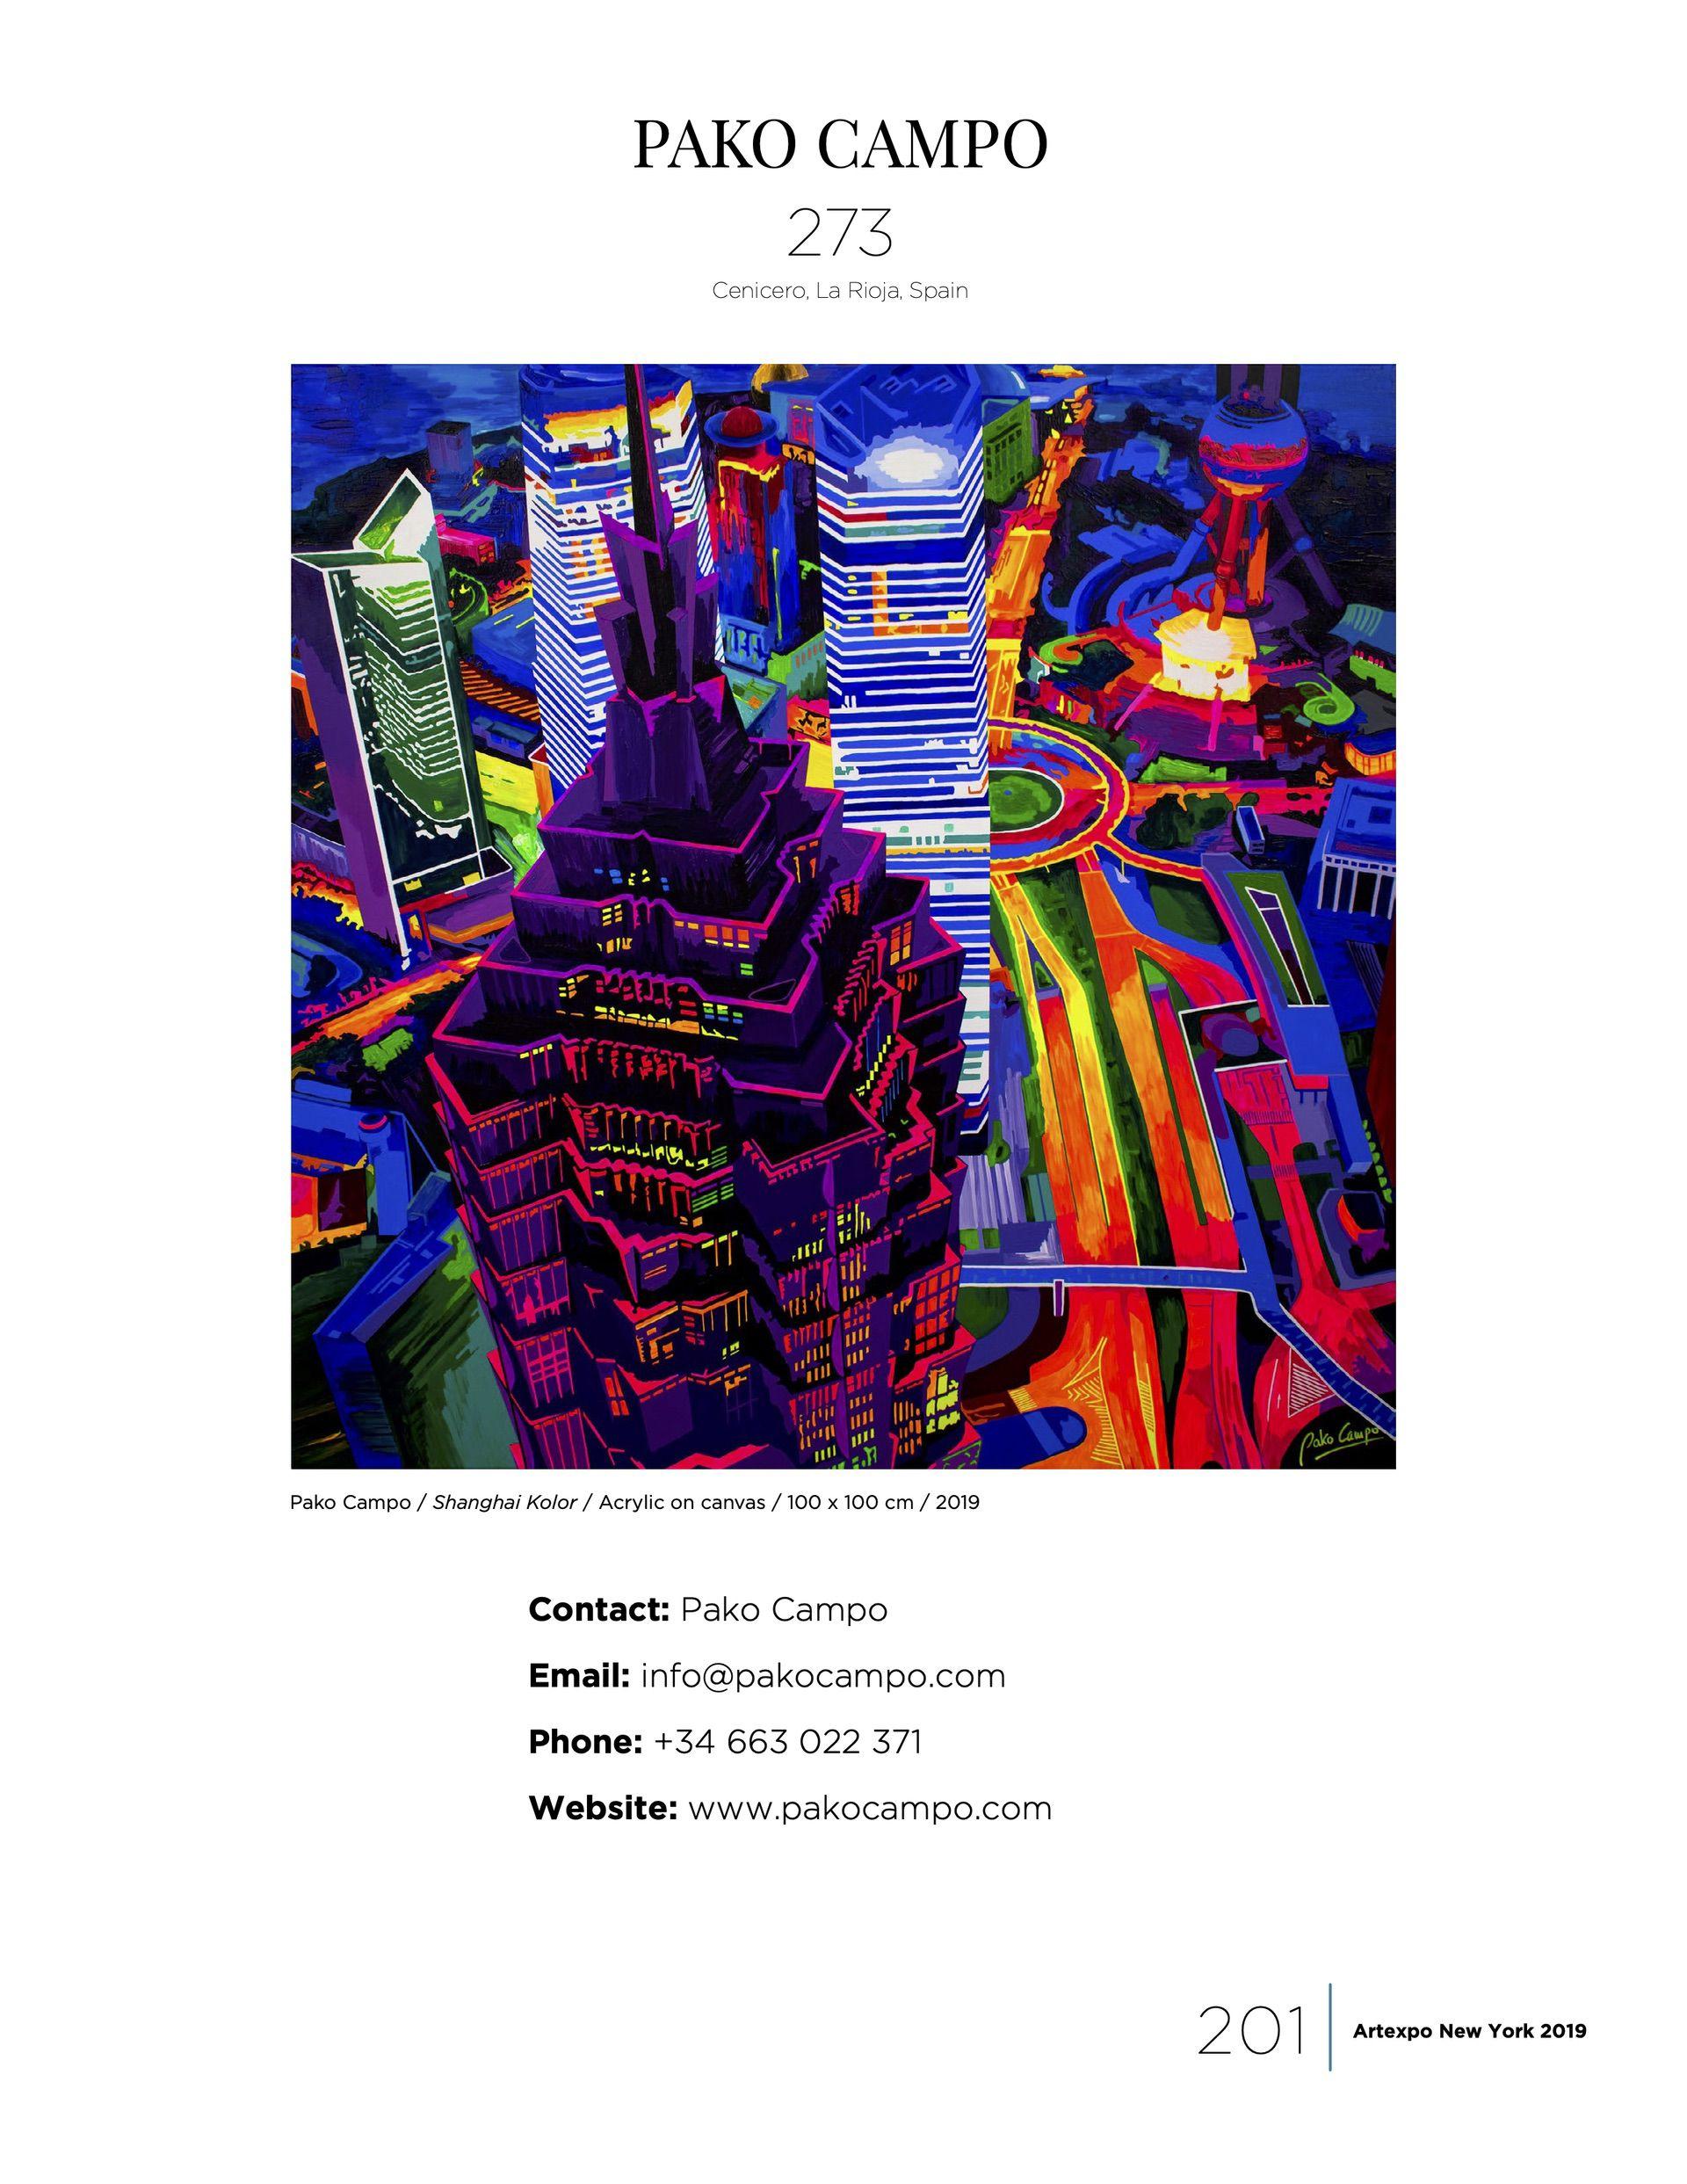 Artexpo New York. 2019 Show Catalog